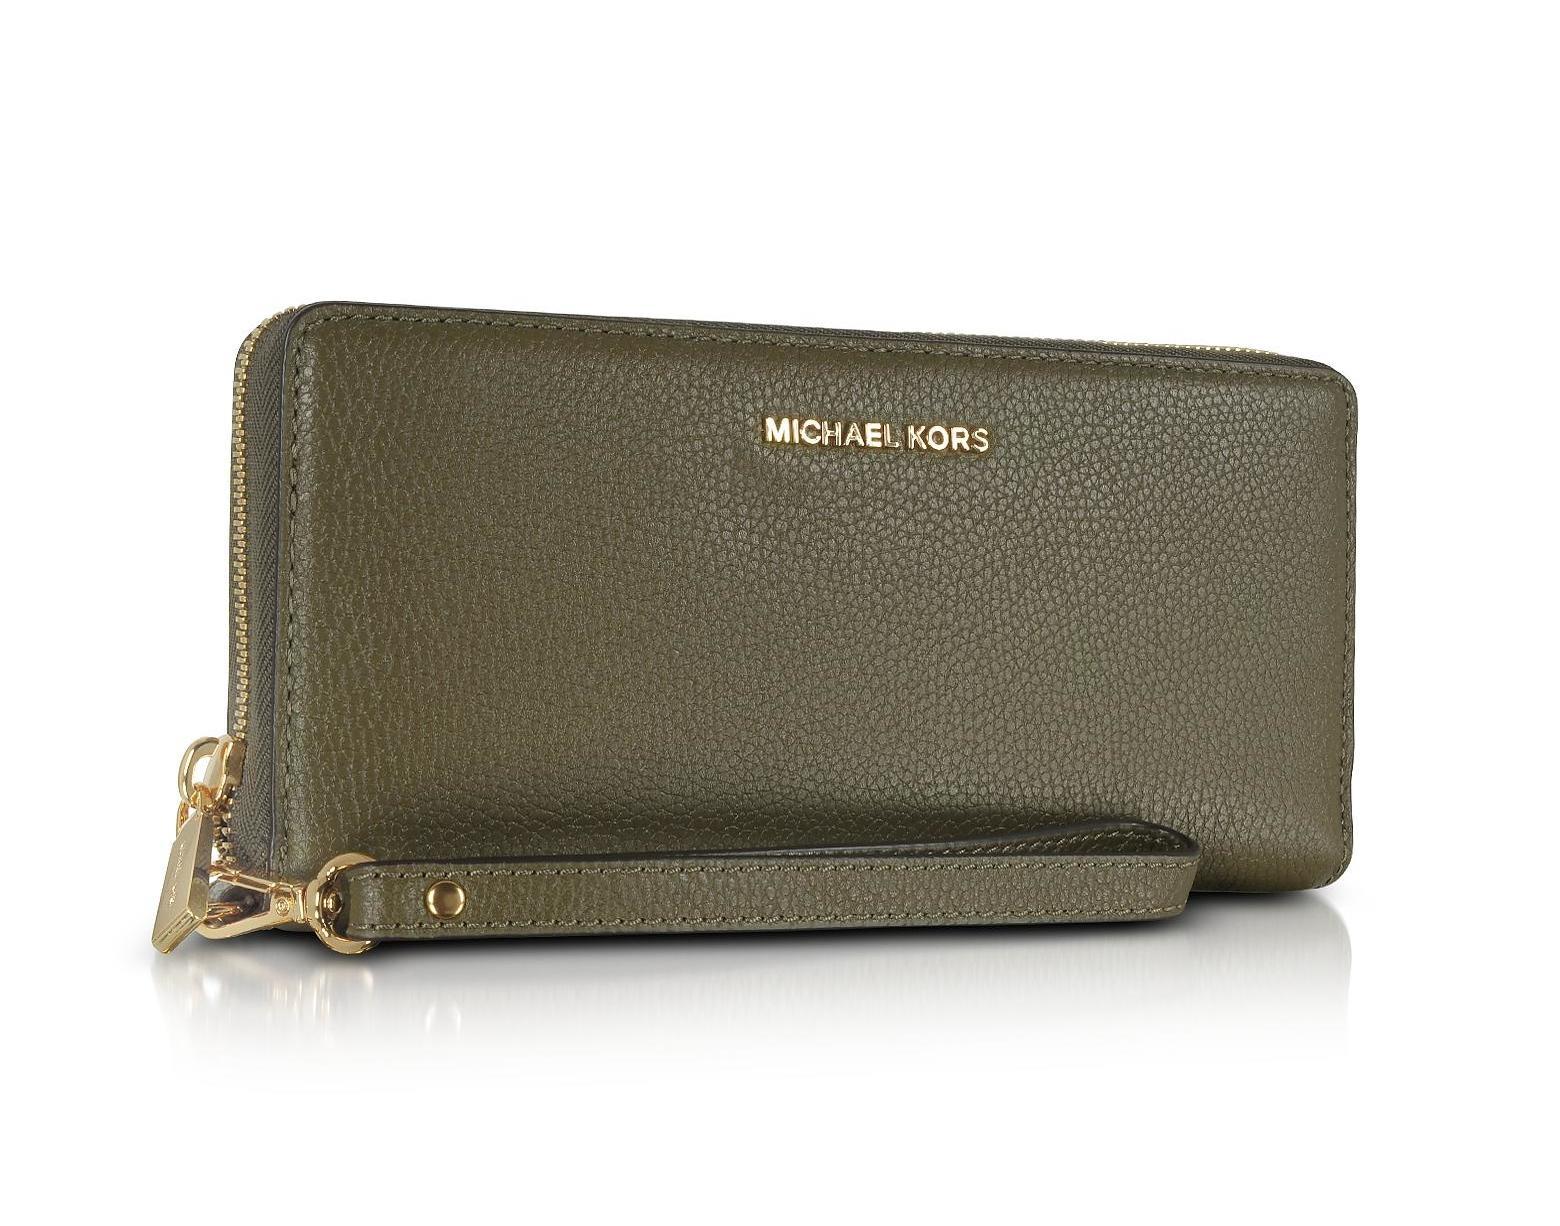 Michael kors peňaženka c5ec1513f3d